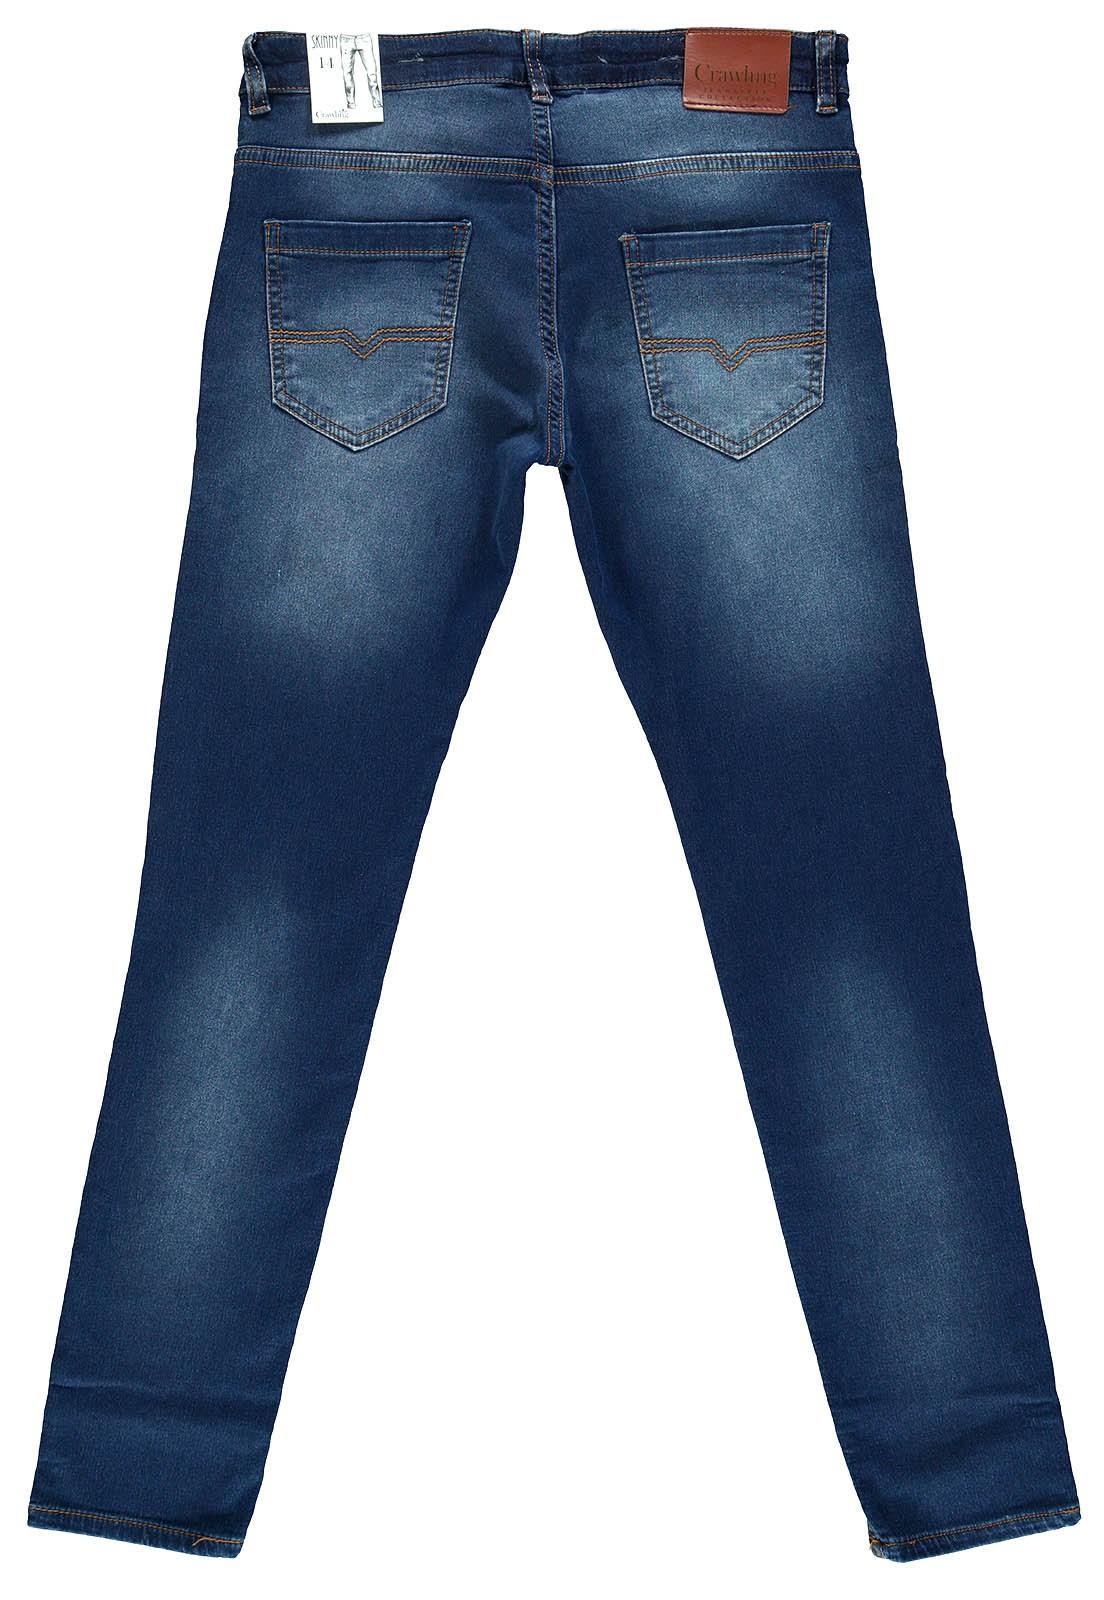 Calça Jeans Moletom Masculina Crawling Skinny